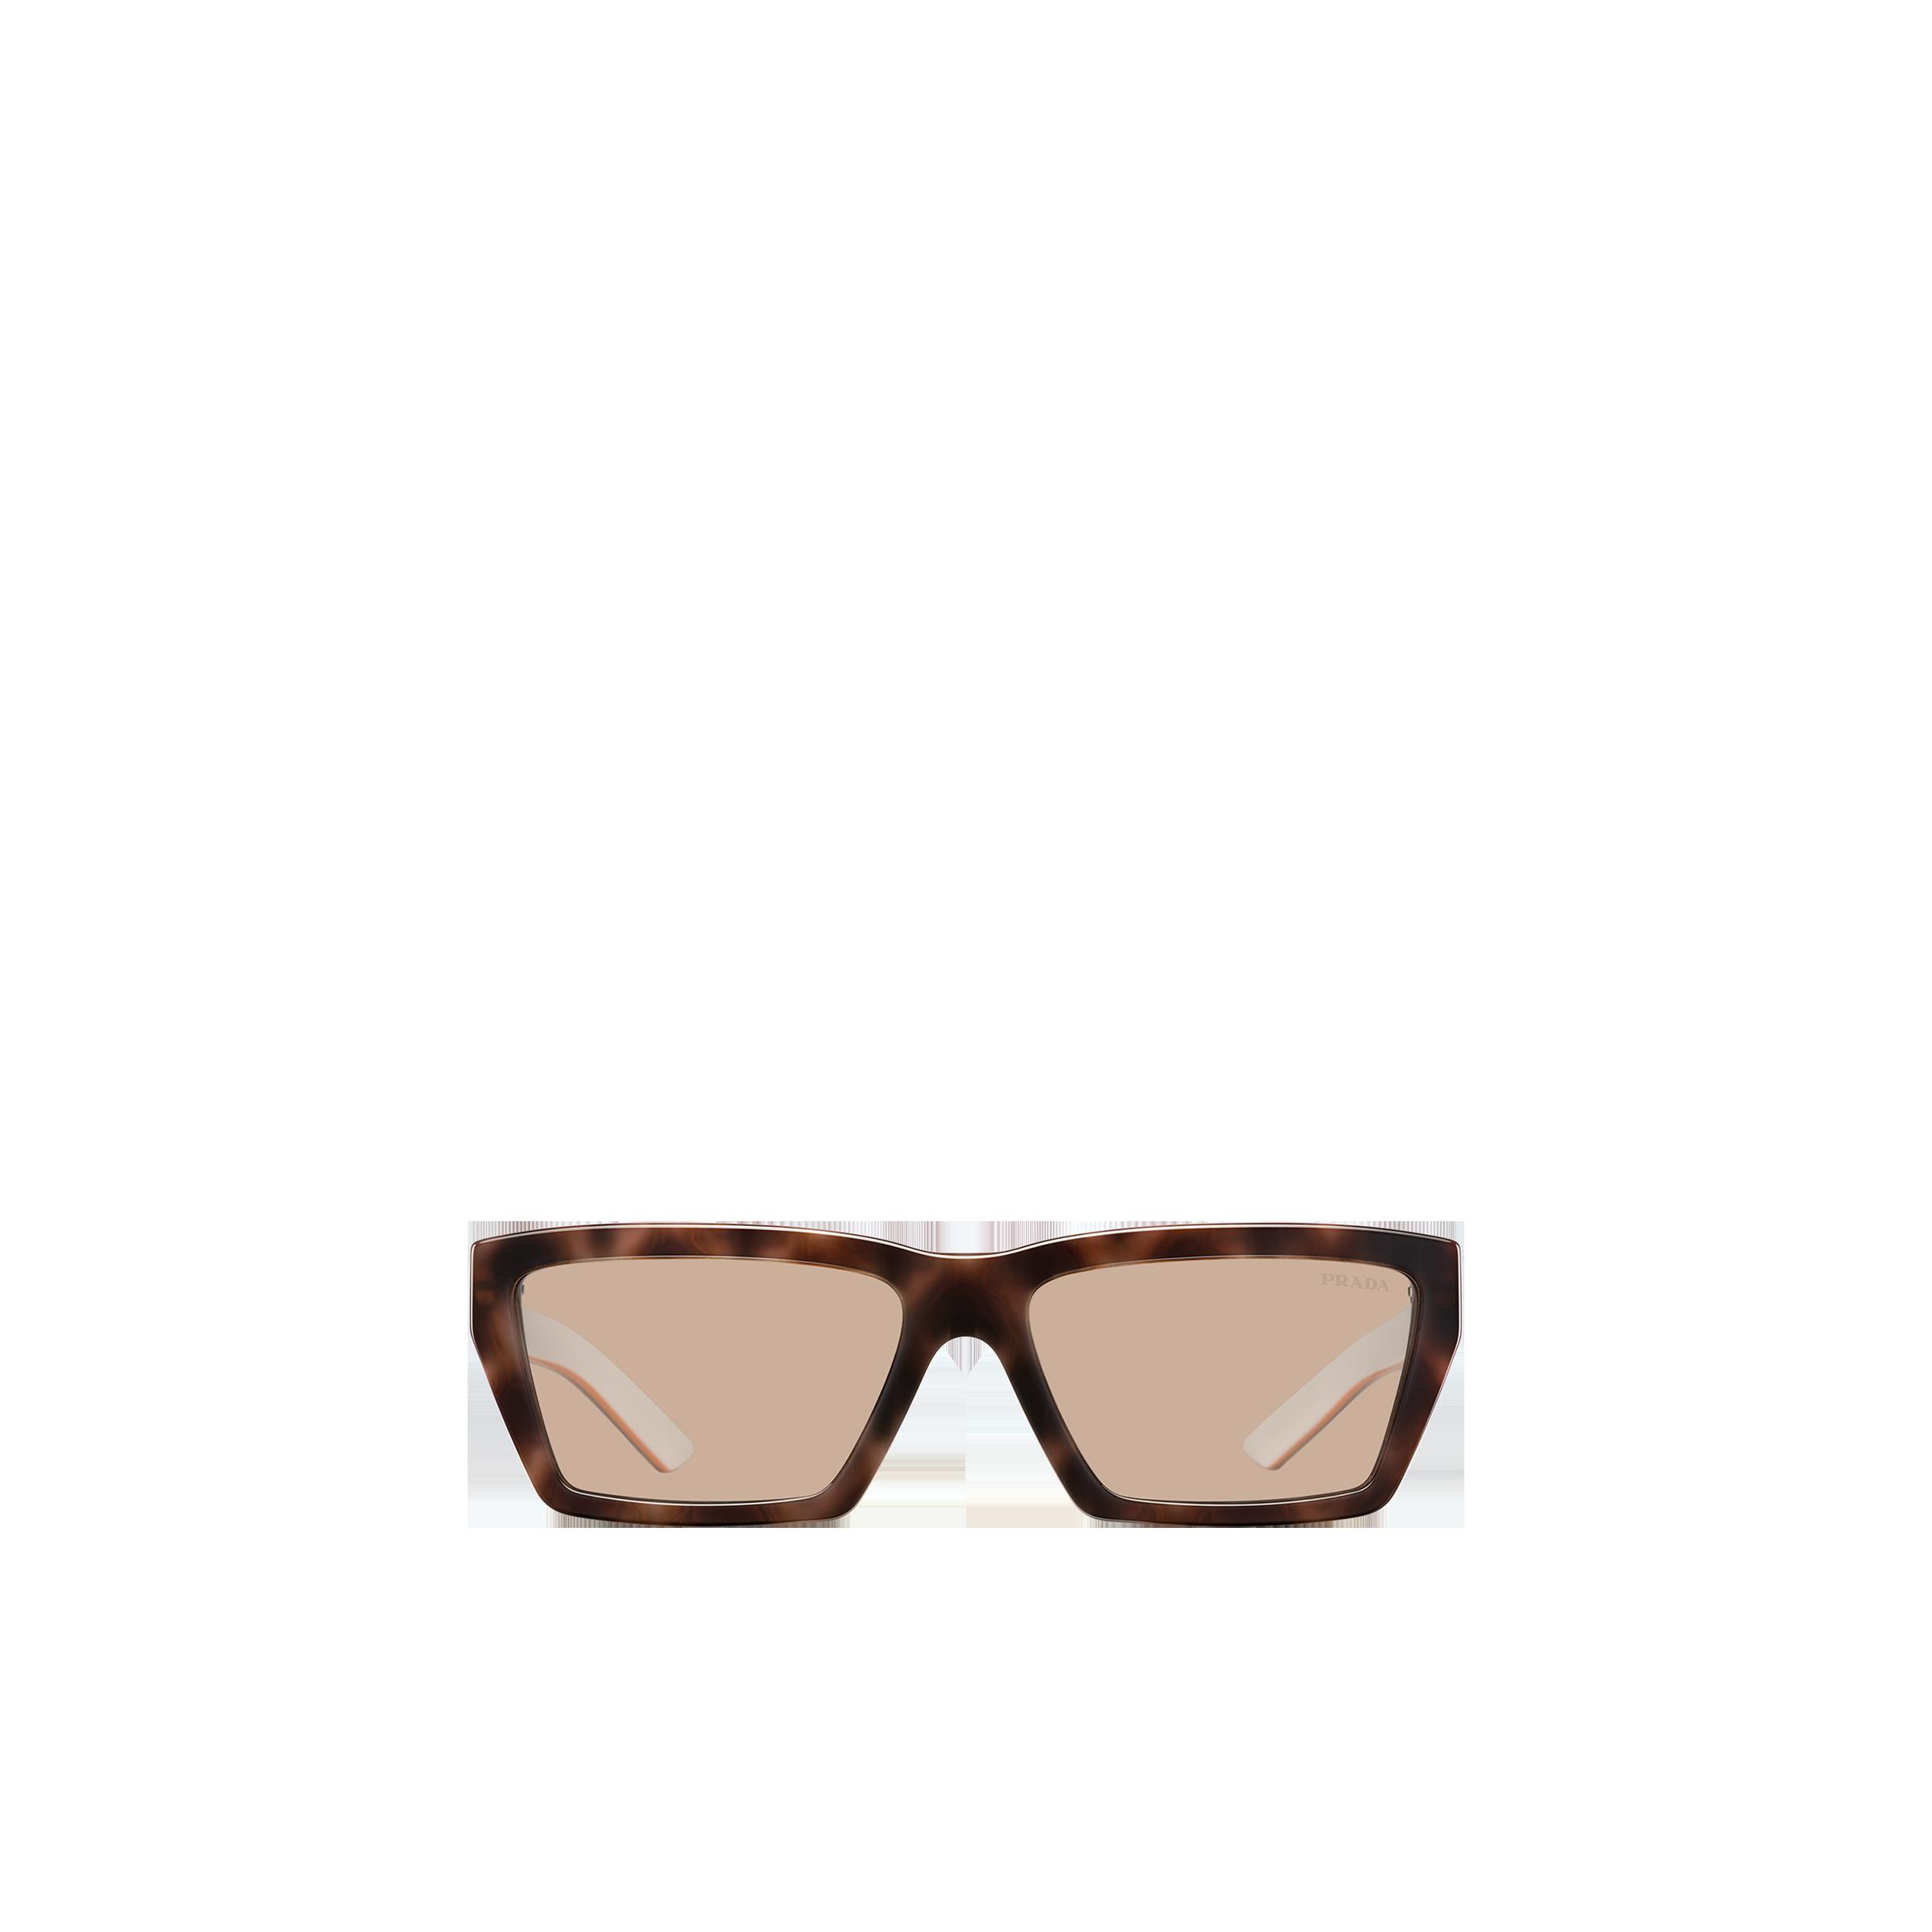 1fd2fbbb3406 Men's Sunglasses | Prada